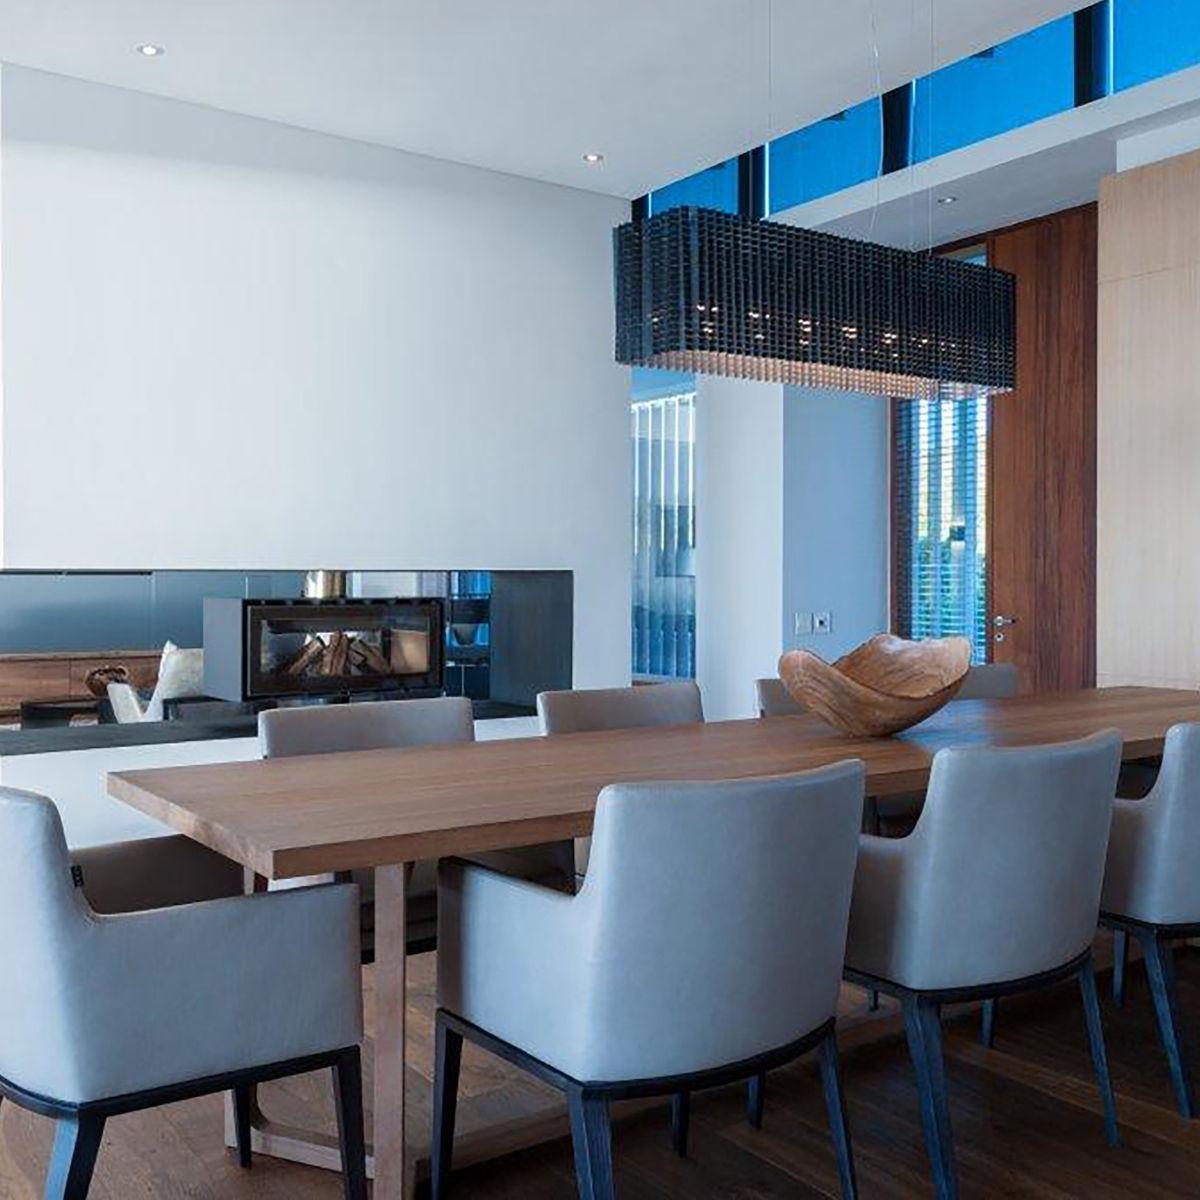 http://www.okha.com/wp-content/uploads/2017/05/grootbos-villa-2-dining-area.jpg